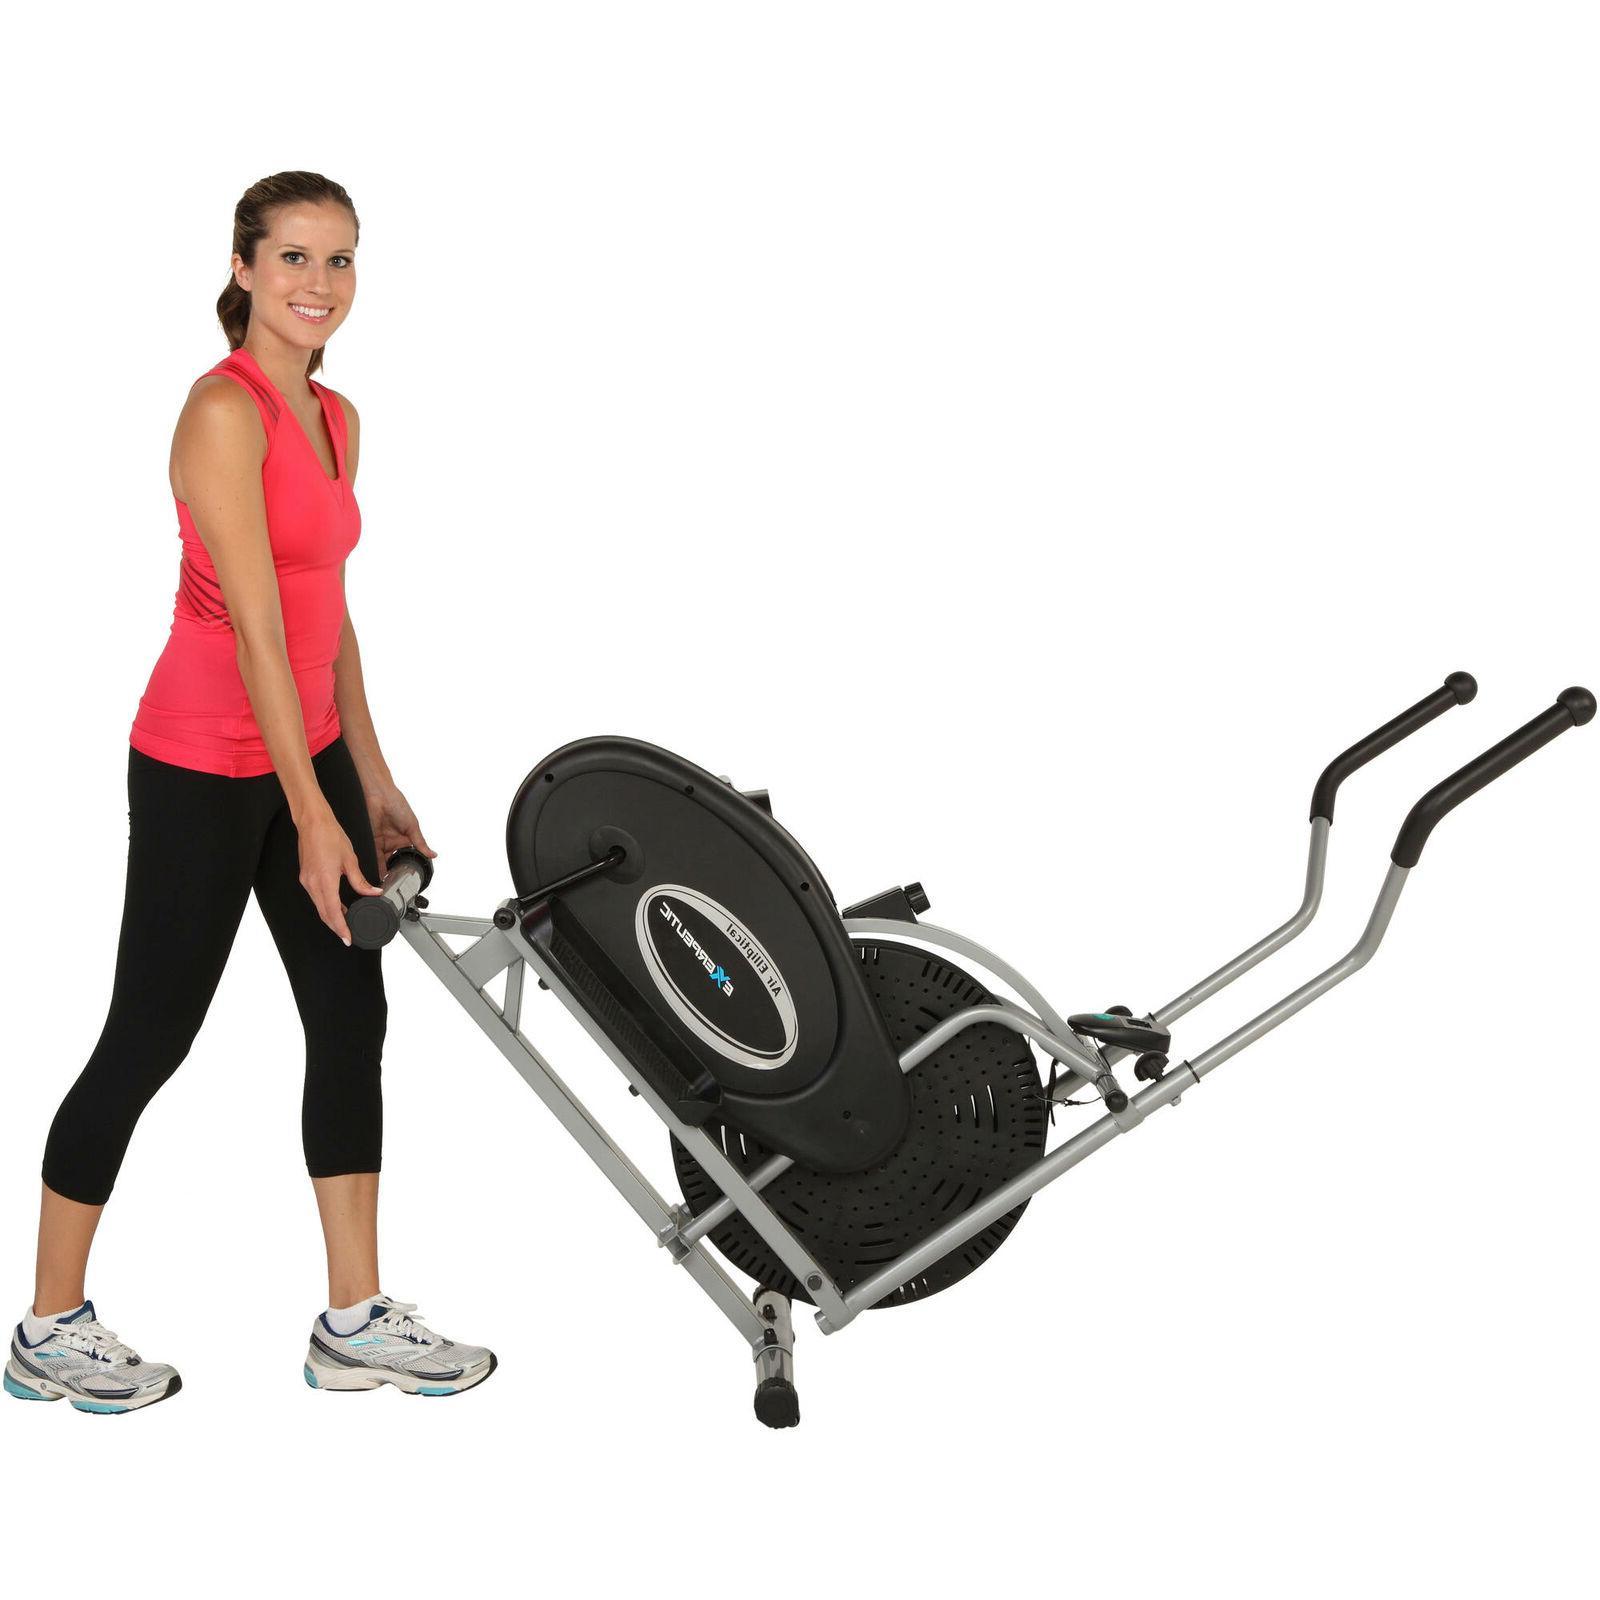 Elliptical Exercise Indoor Fitness Trainer Workout Cardio Equipment